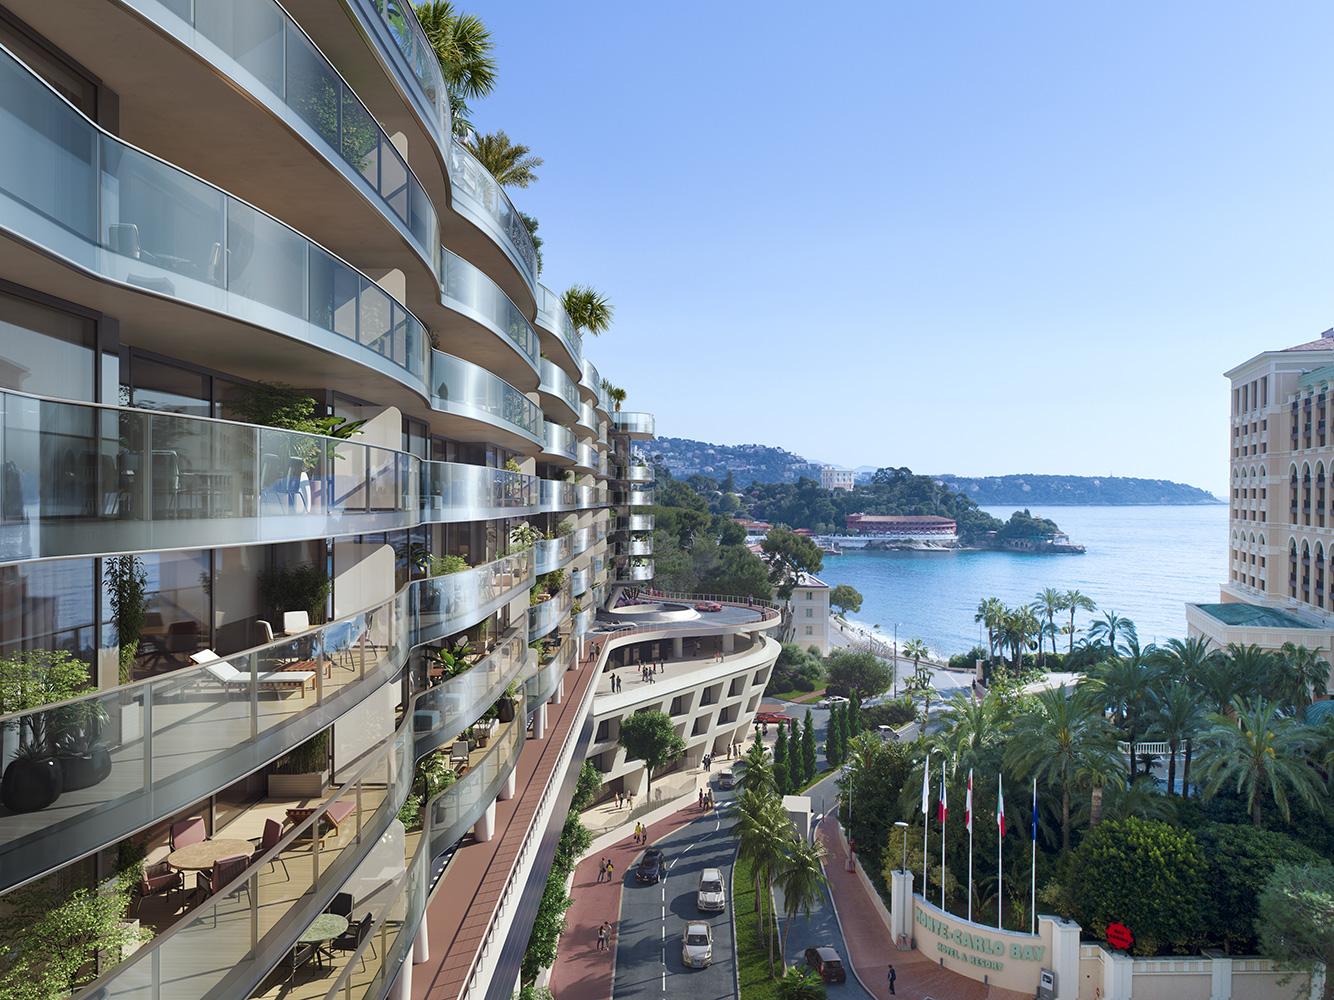 Marzocco_Tour_Monaco_07